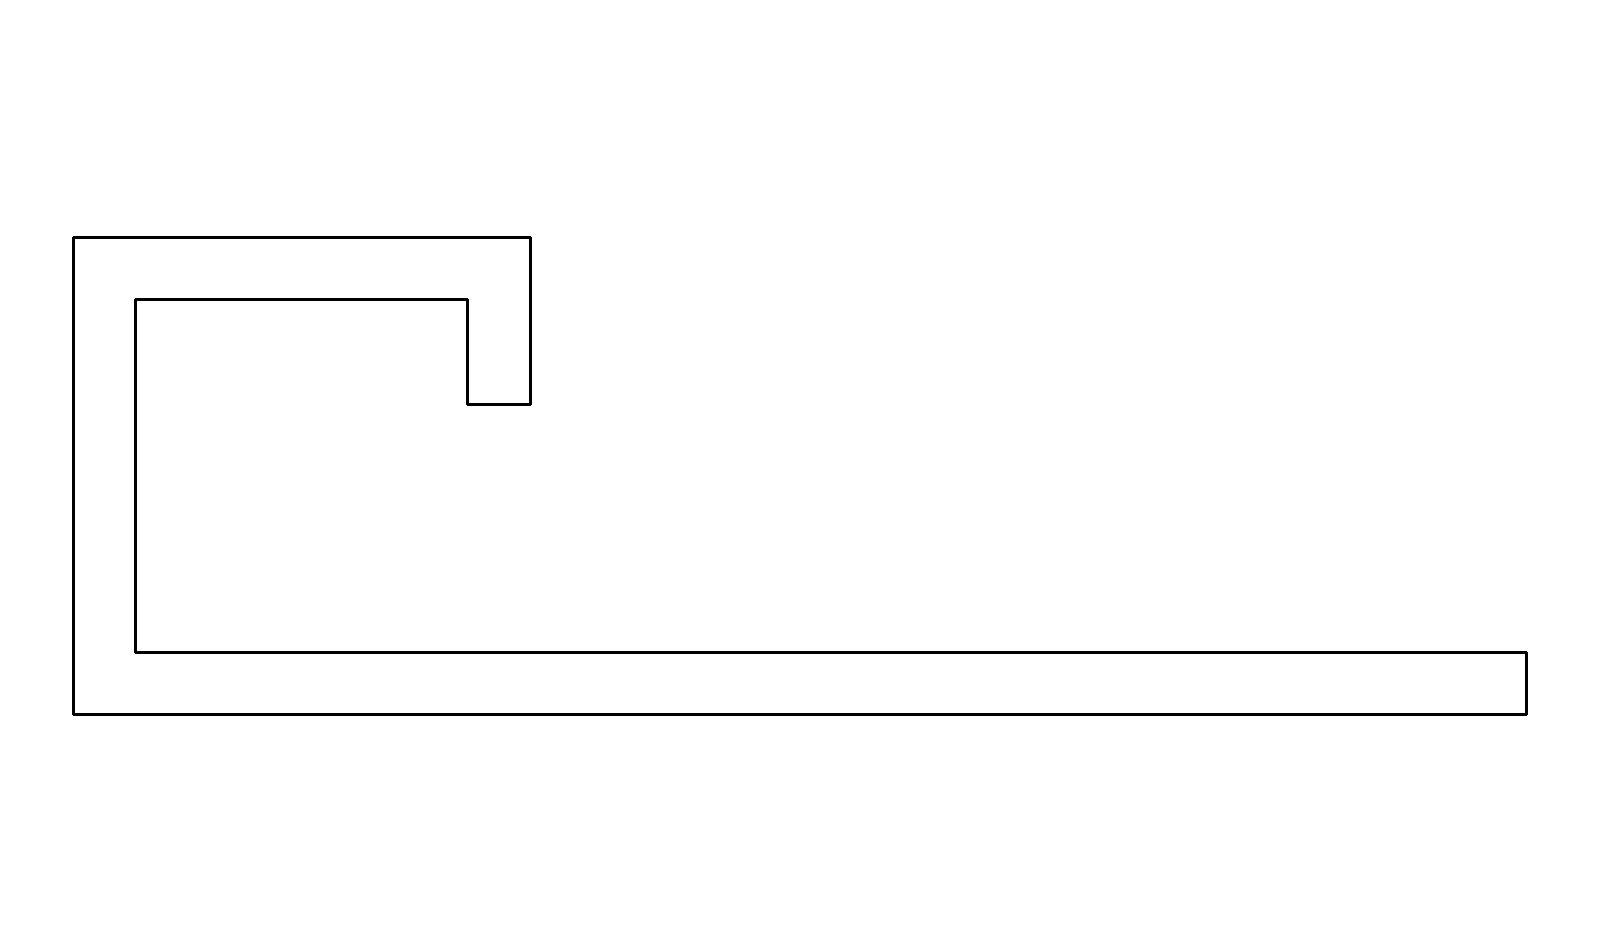 Countertop Material Revit : Tile and Tile Setting Materials: Edge Protection: Walls: Countertops ...